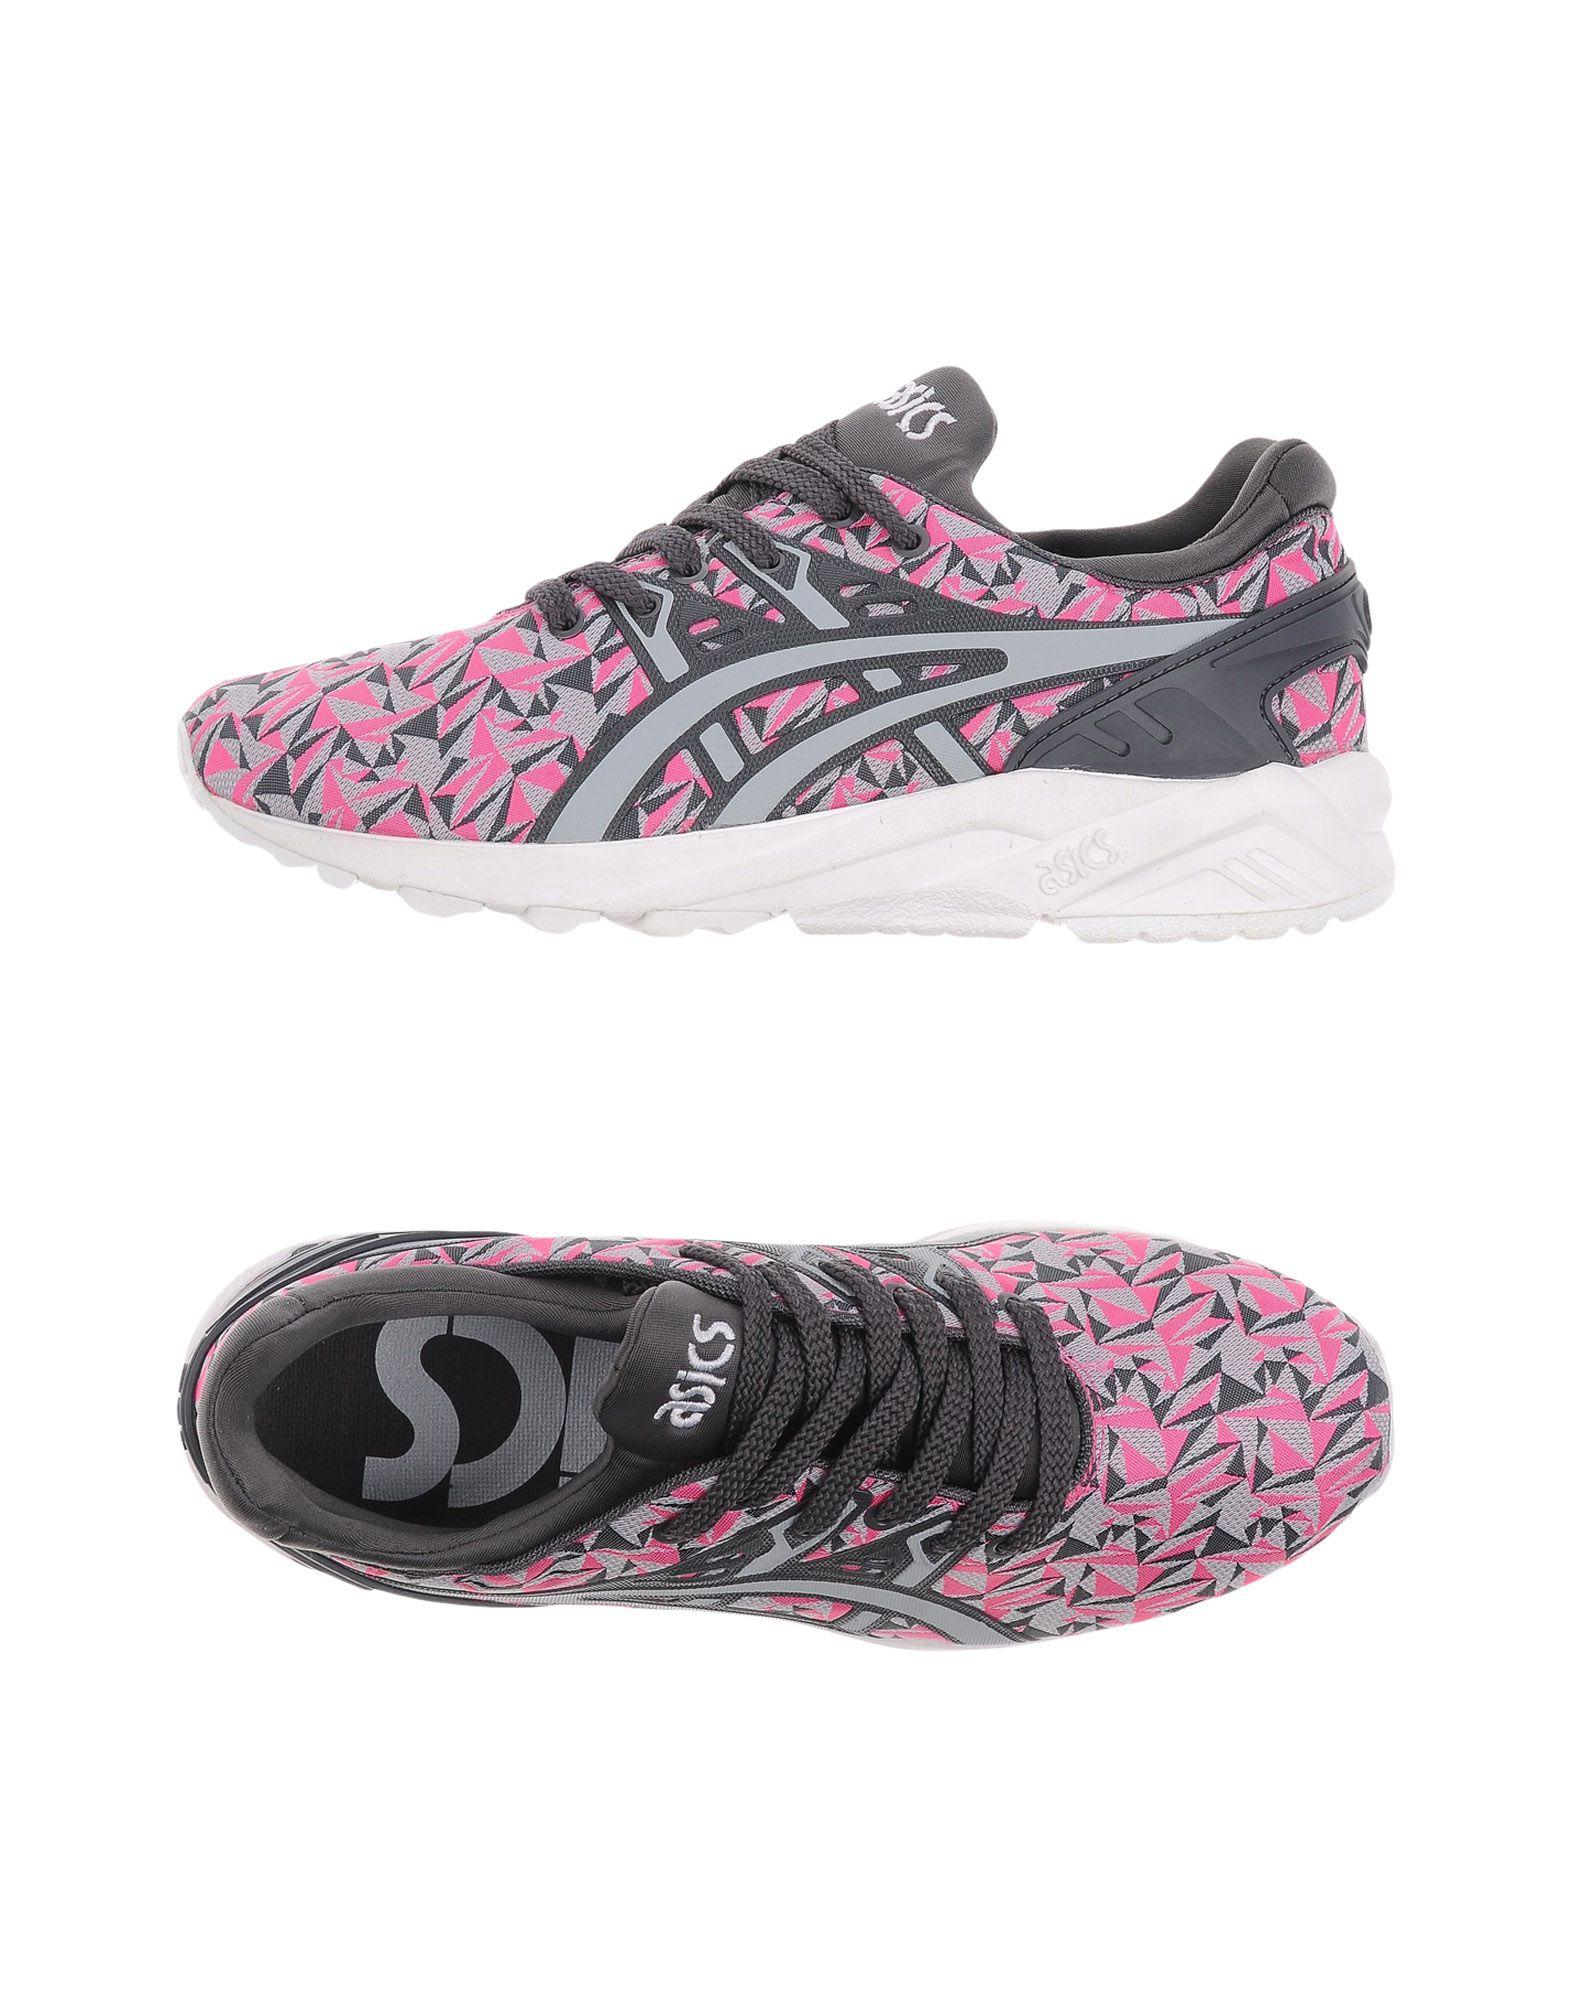 Moda Sneakers Asics Donna - 11233442DI 11233442DI - 7a513f